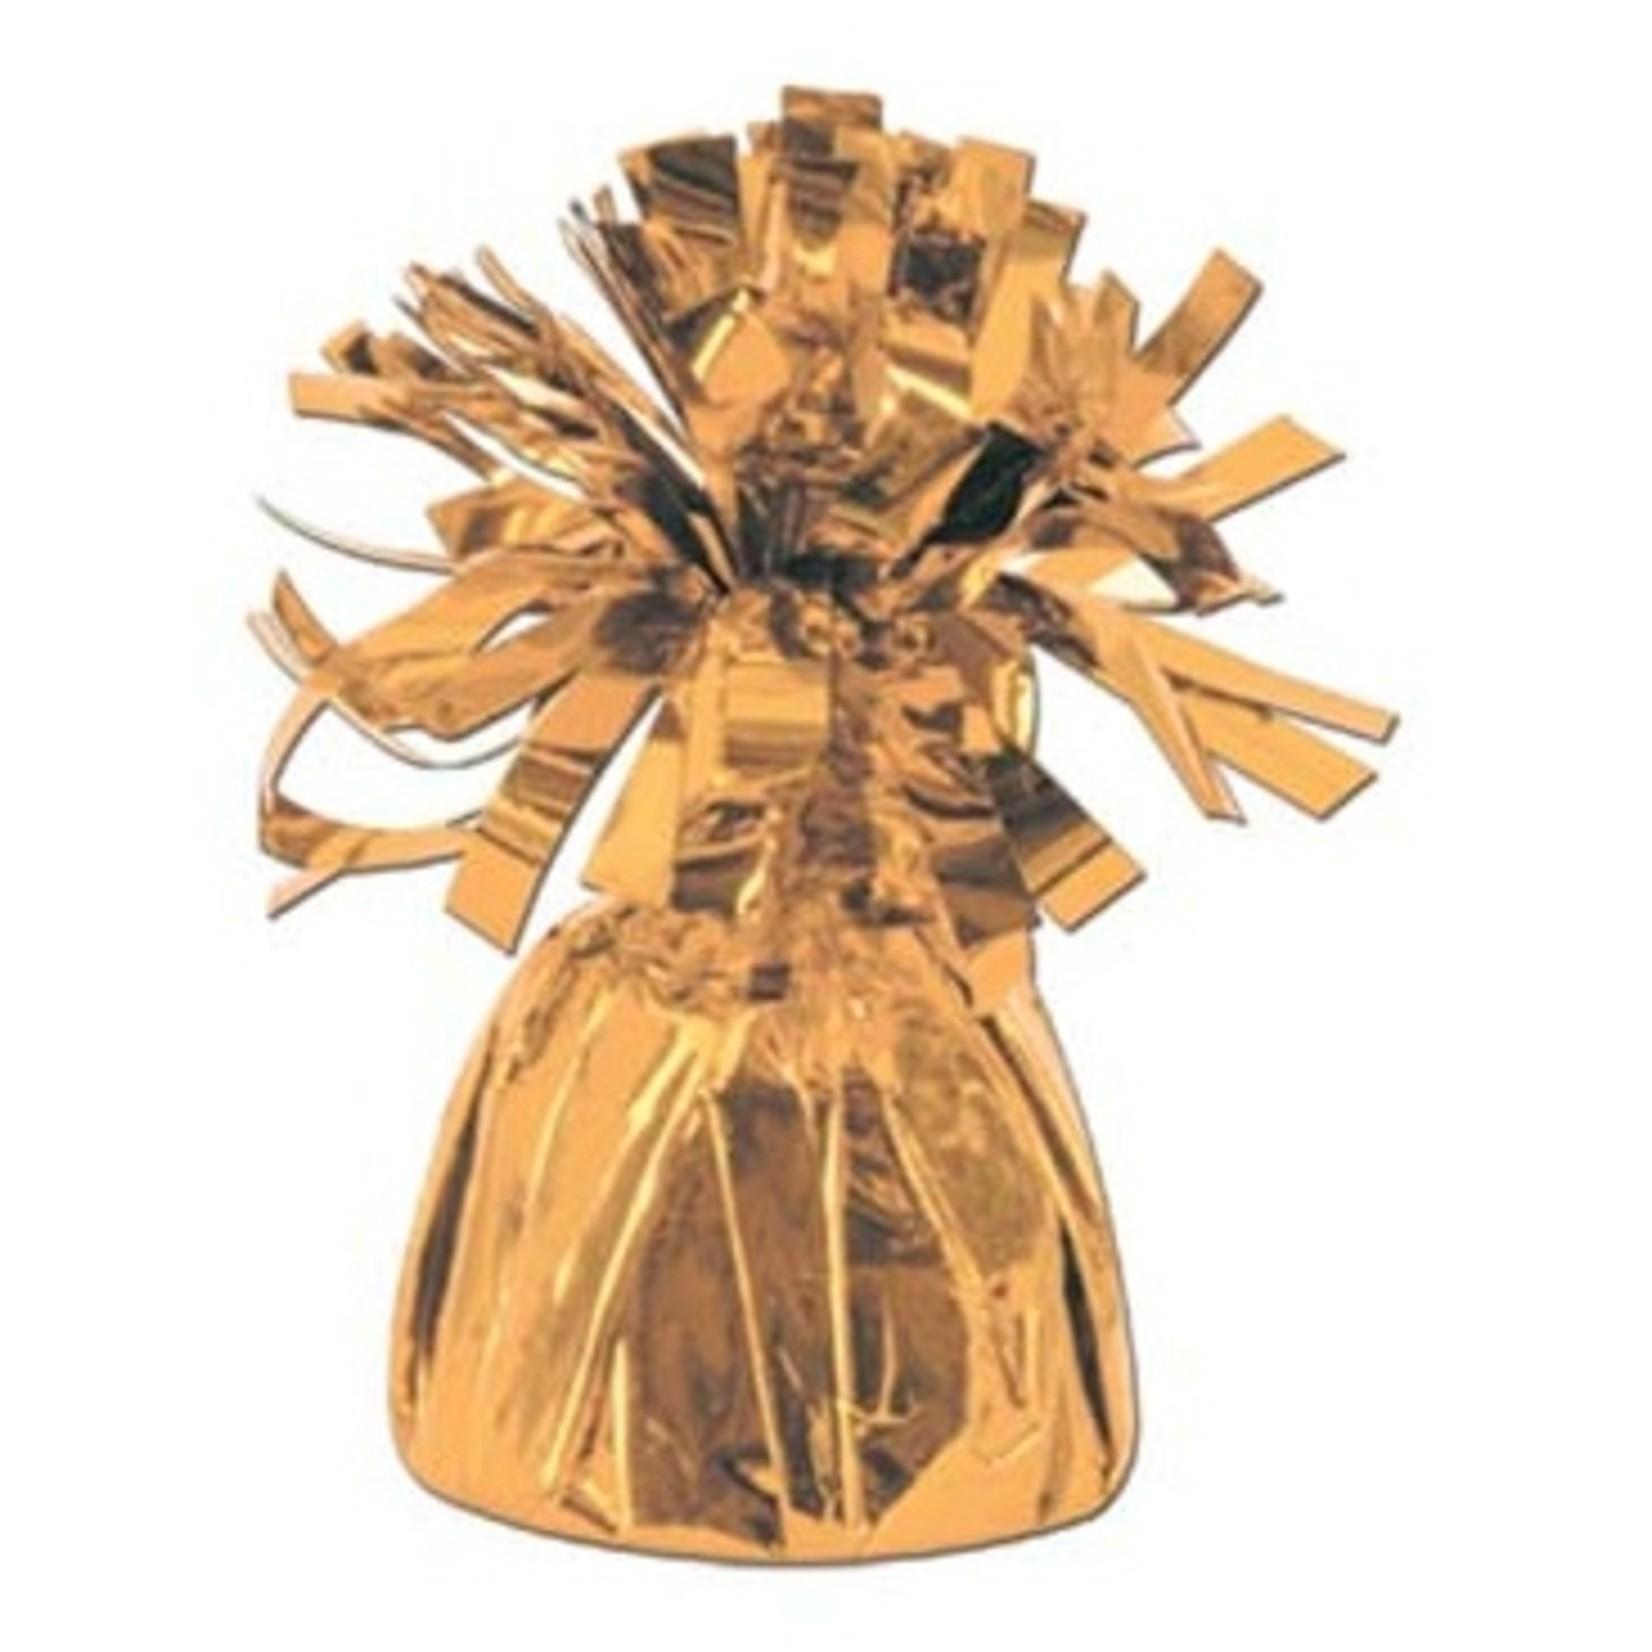 Balloon Weight-Metallic-Copper-1pkg-6oz